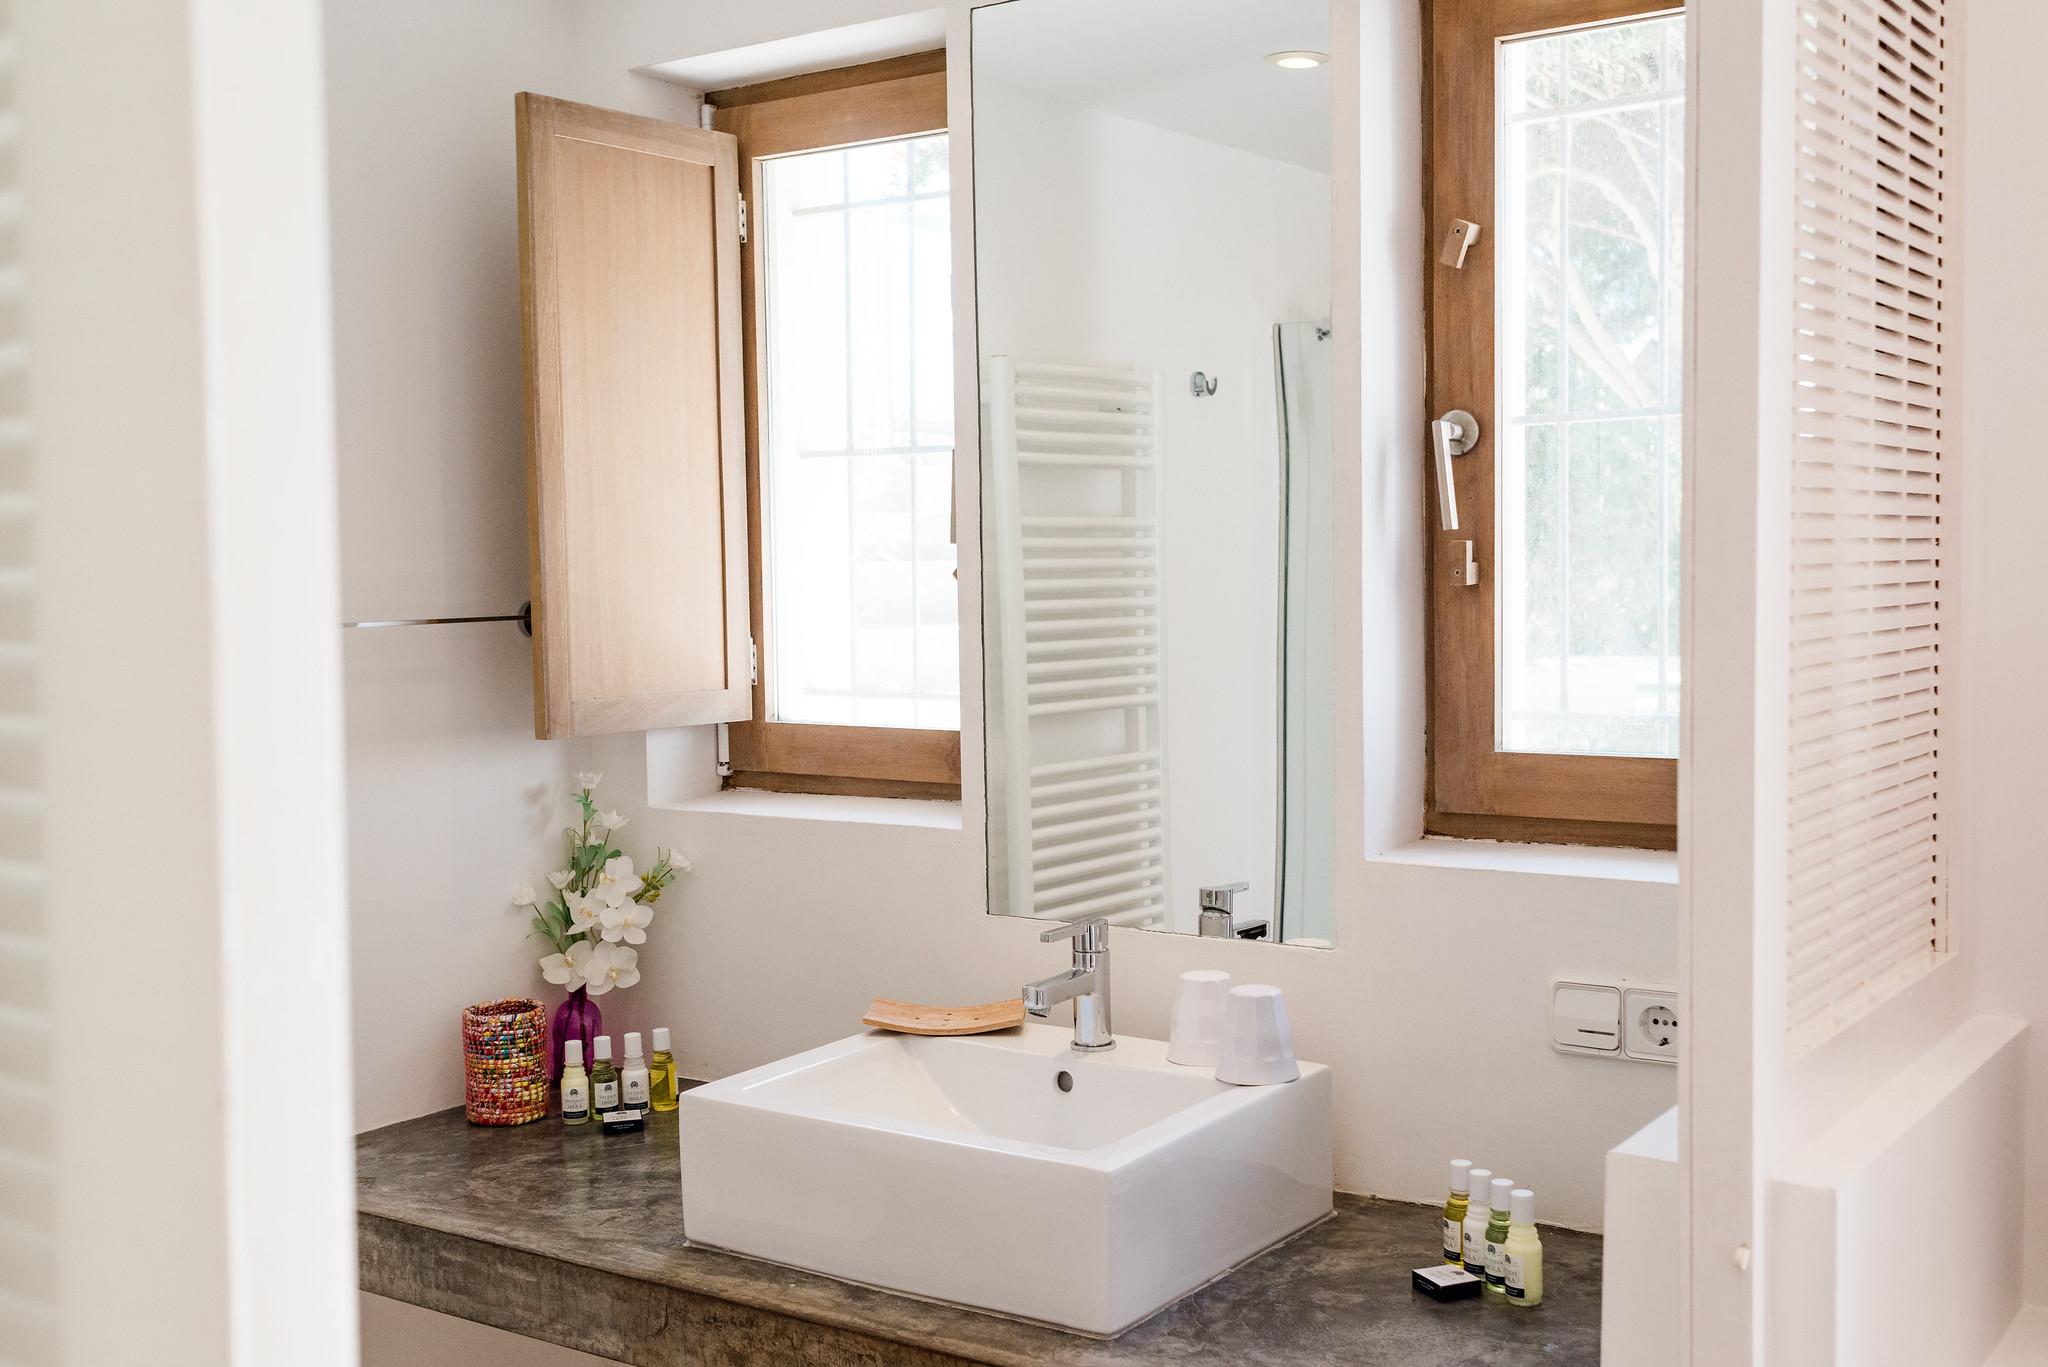 https://www.white-ibiza.com/wp-content/uploads/2020/06/white-ibiza-villas-casa-nyah-interior-bathroom.jpg